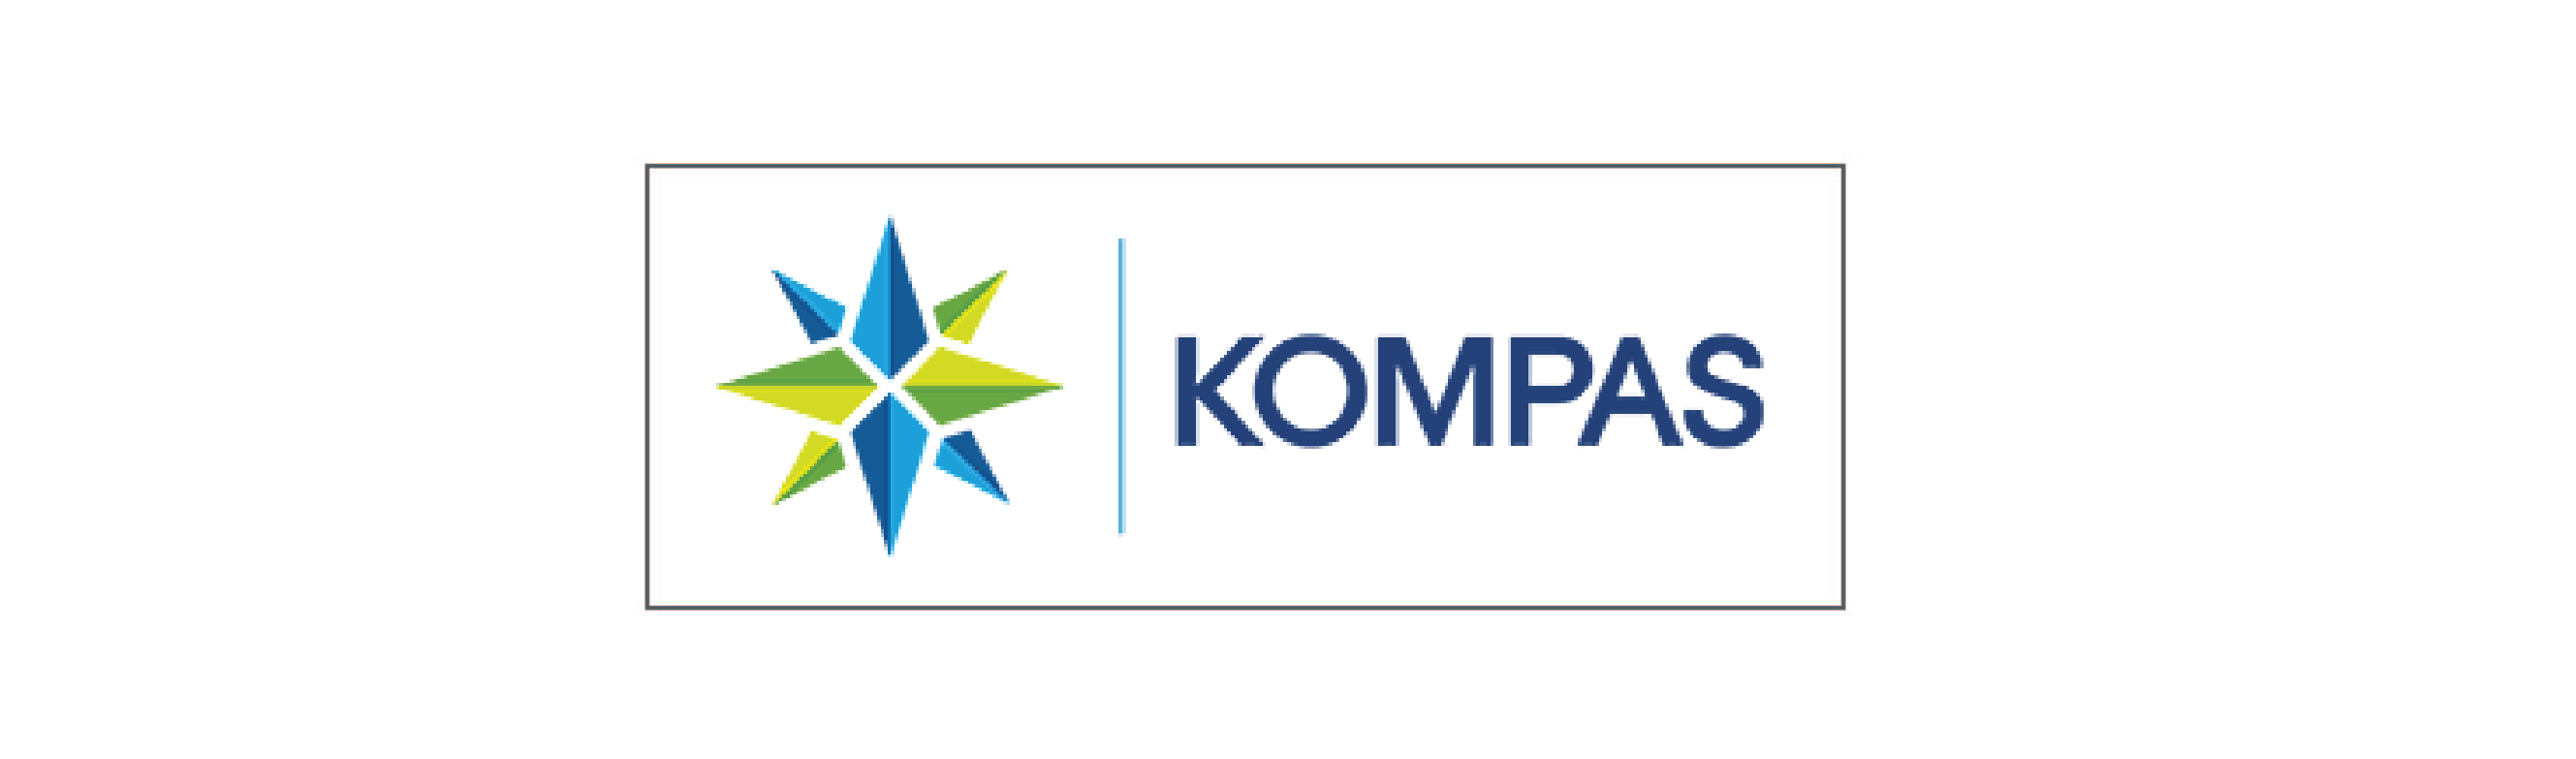 kompas-01-01